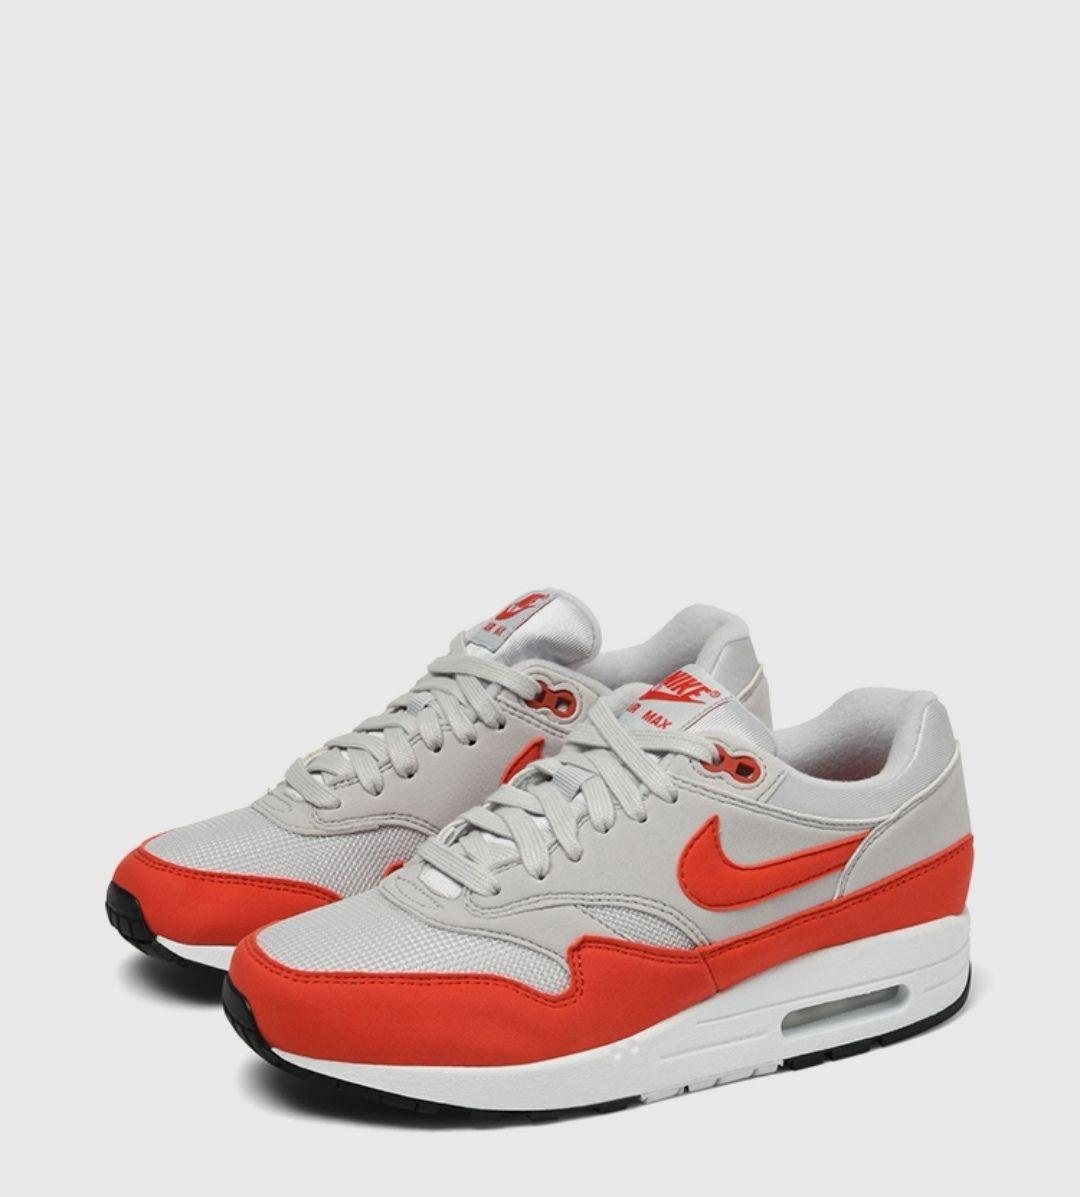 Paire de chaussure Nike WMNS Air Max 1